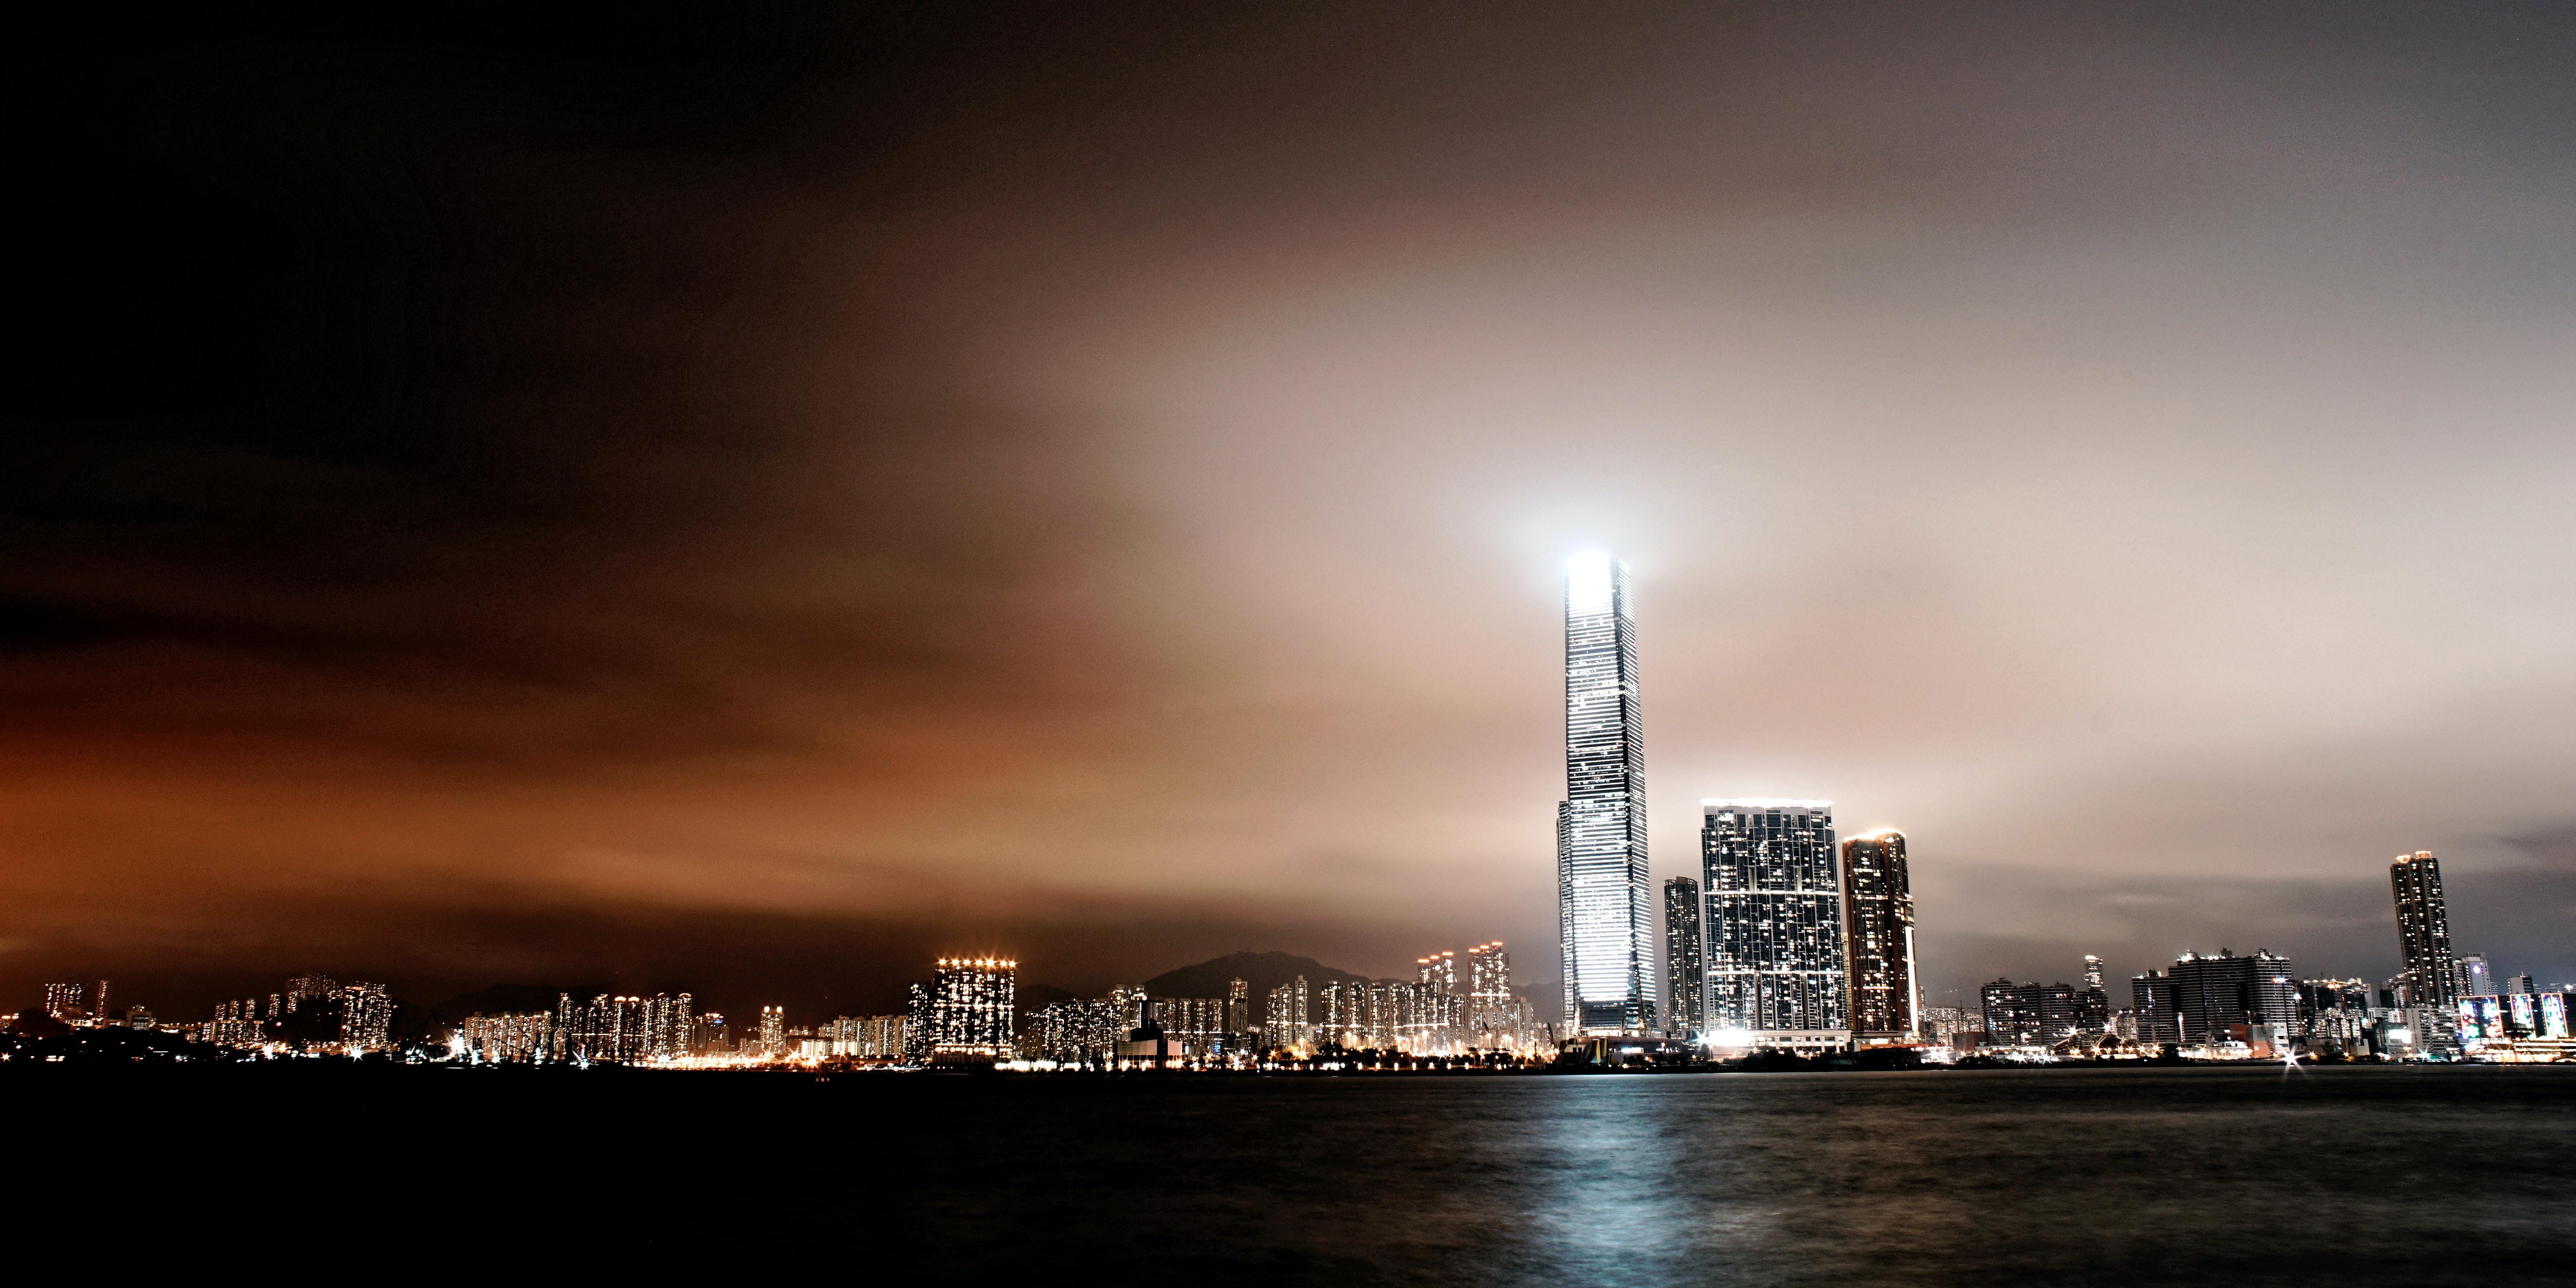 city skyline near body of water during nighttimne